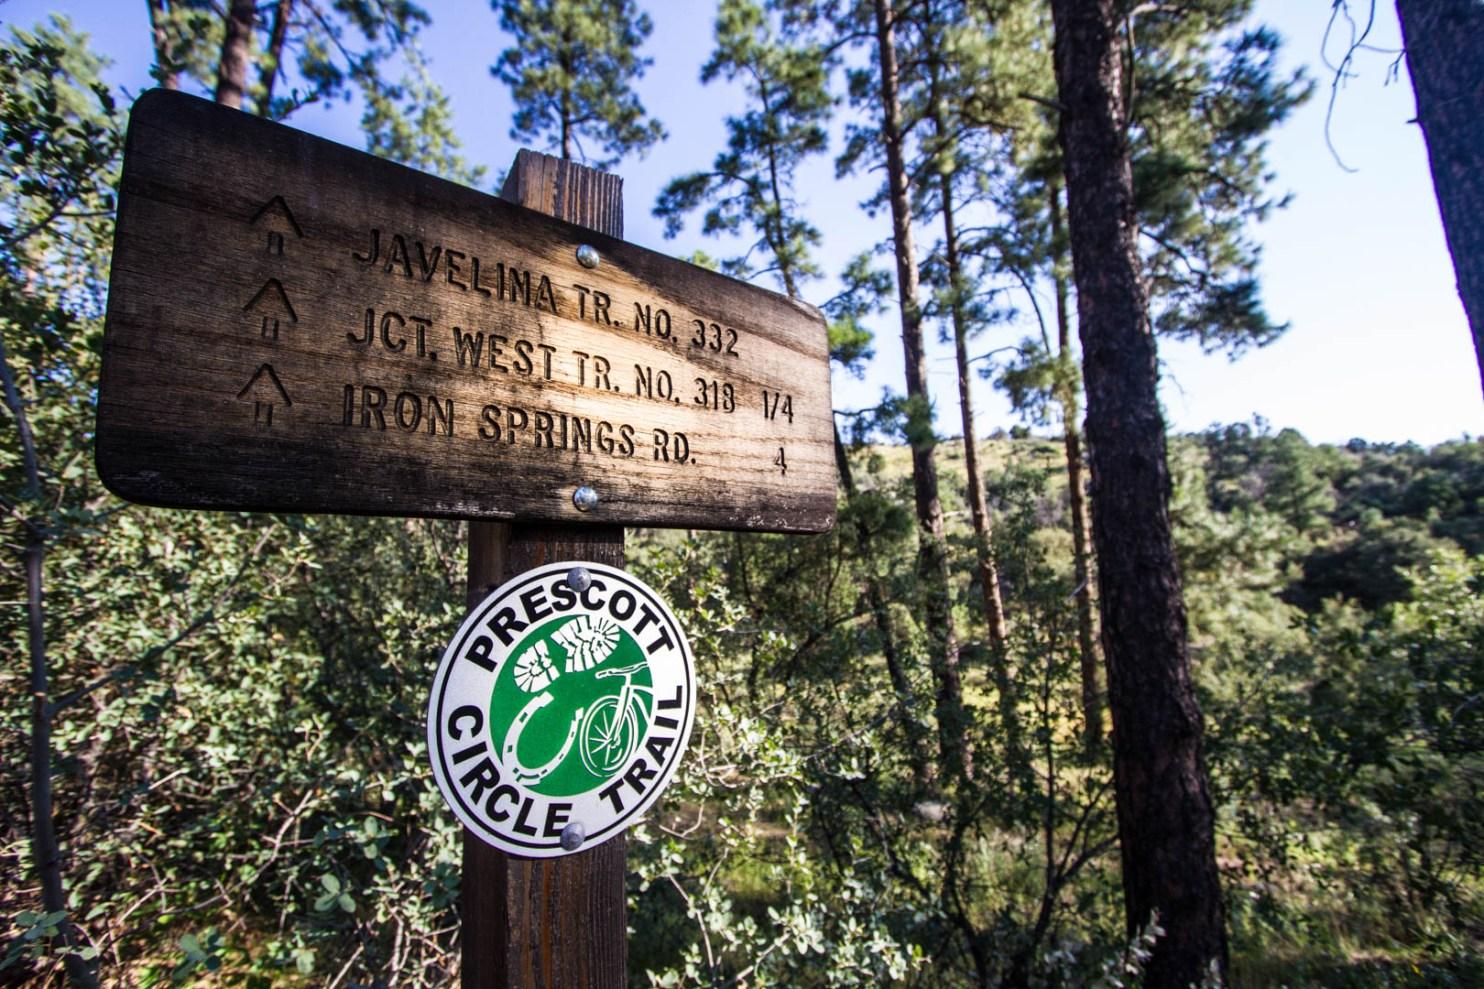 Prescott Arizona Recreation hiking trails mountain biking running outdoors